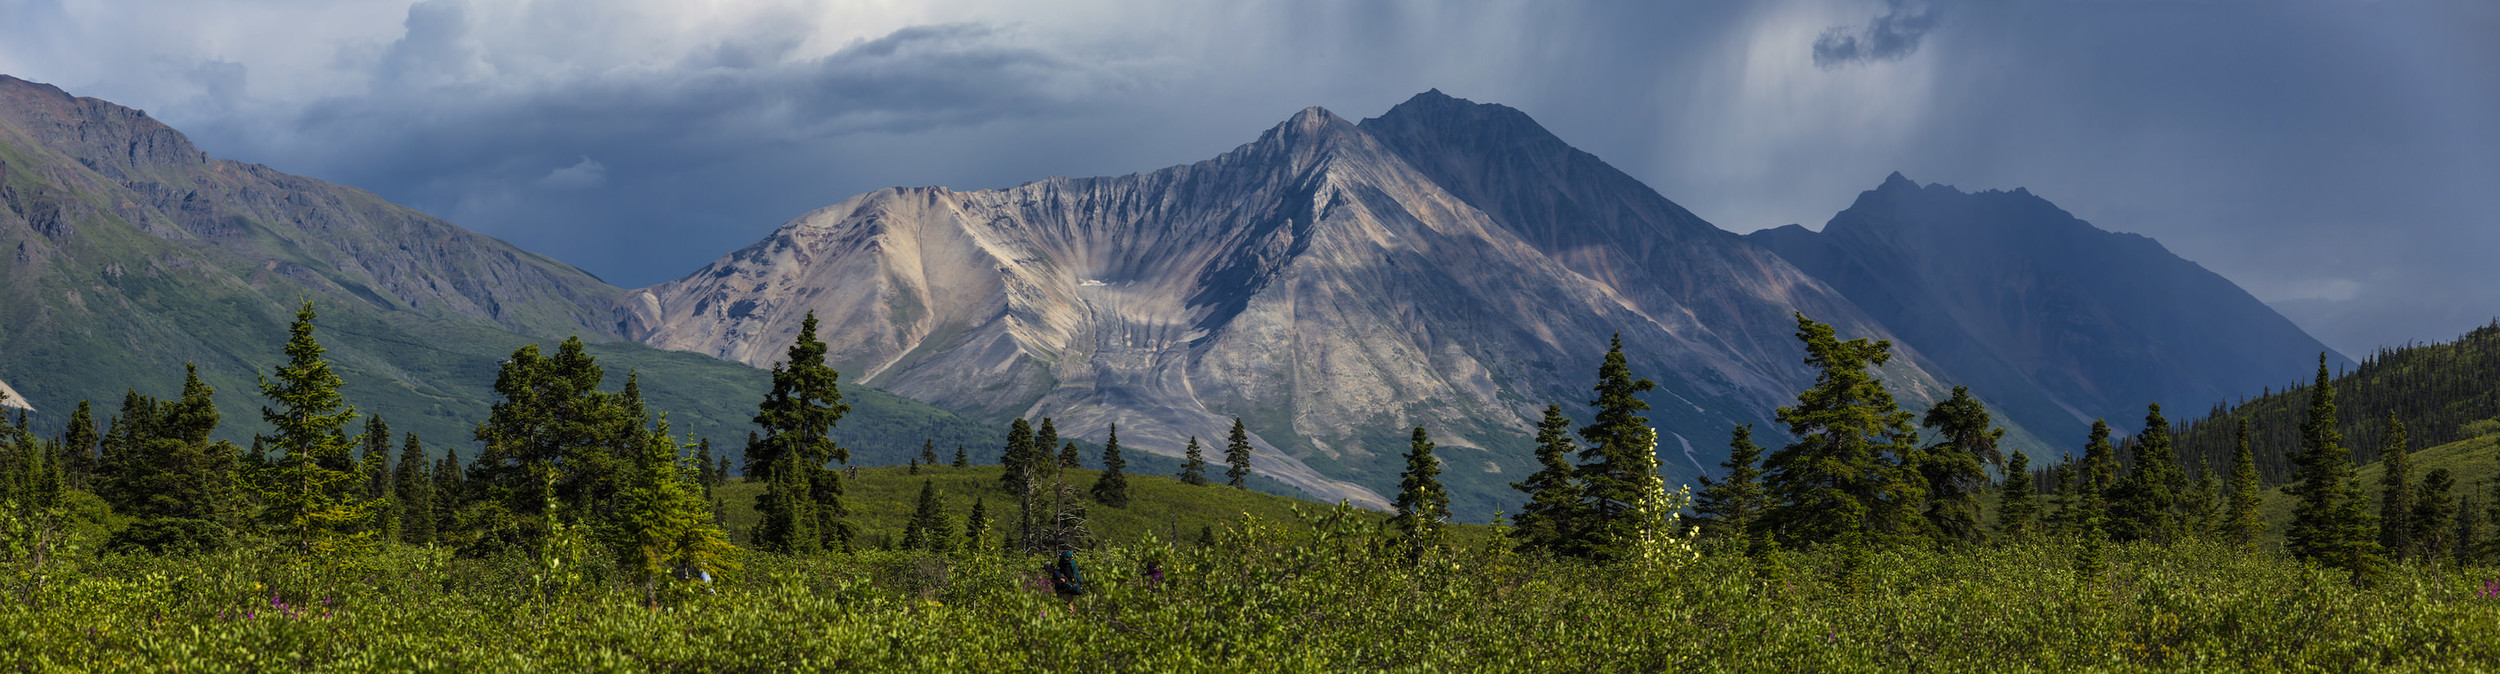 PORPHYRY MOUNTAIN & NATIONAL CREEK ROCK GLACIER FROM DONOHO BASIN -(PHOTO: NPS/ JACOB W. FRANK)